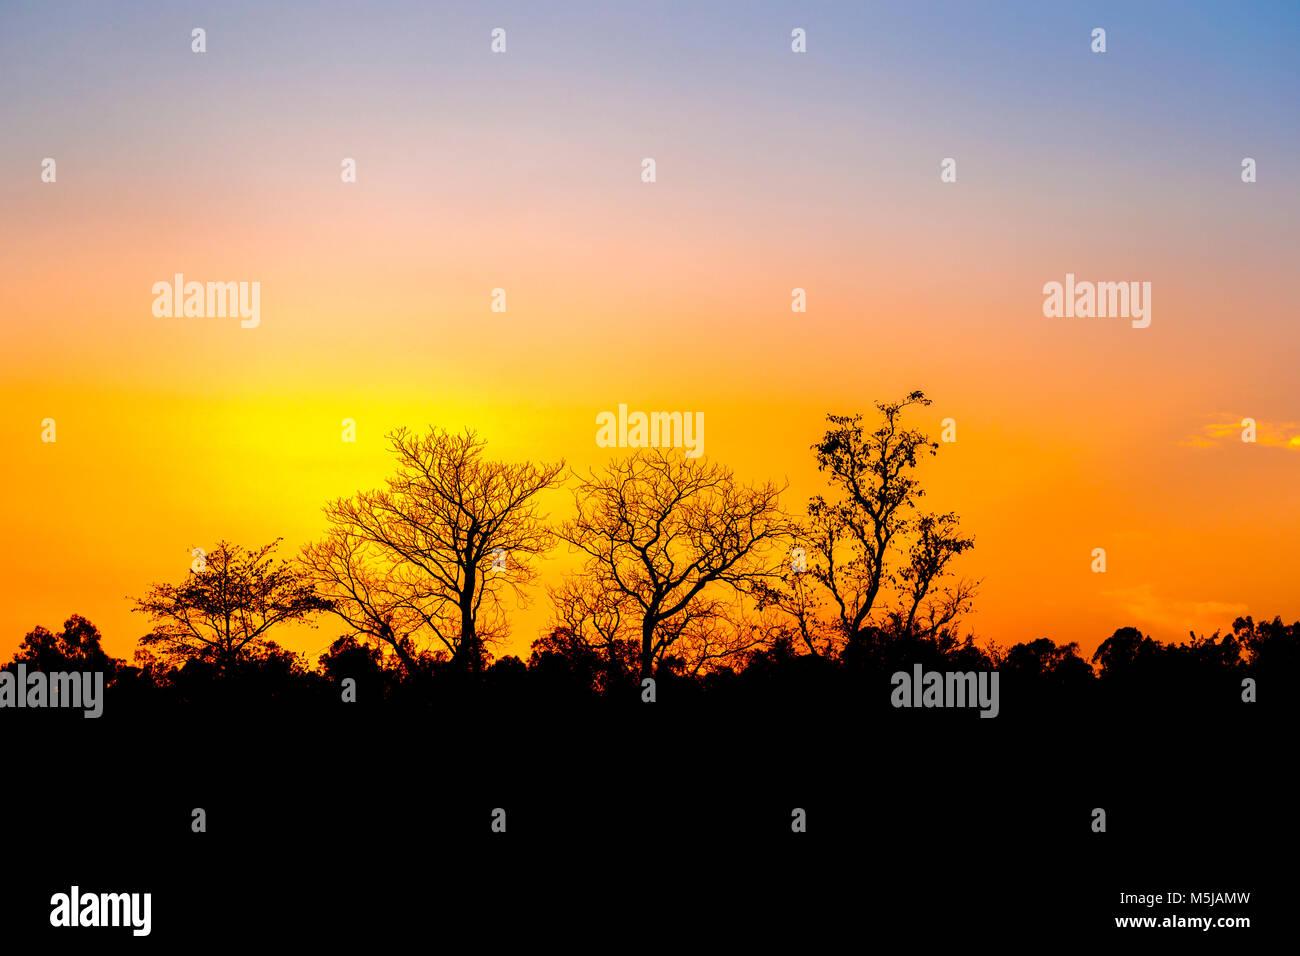 Leafless trees silhouetted against the sky at sunset, Jim Corbett National Park wildlife sanctuary, Ramnagar, Uttarakhand - Stock Image